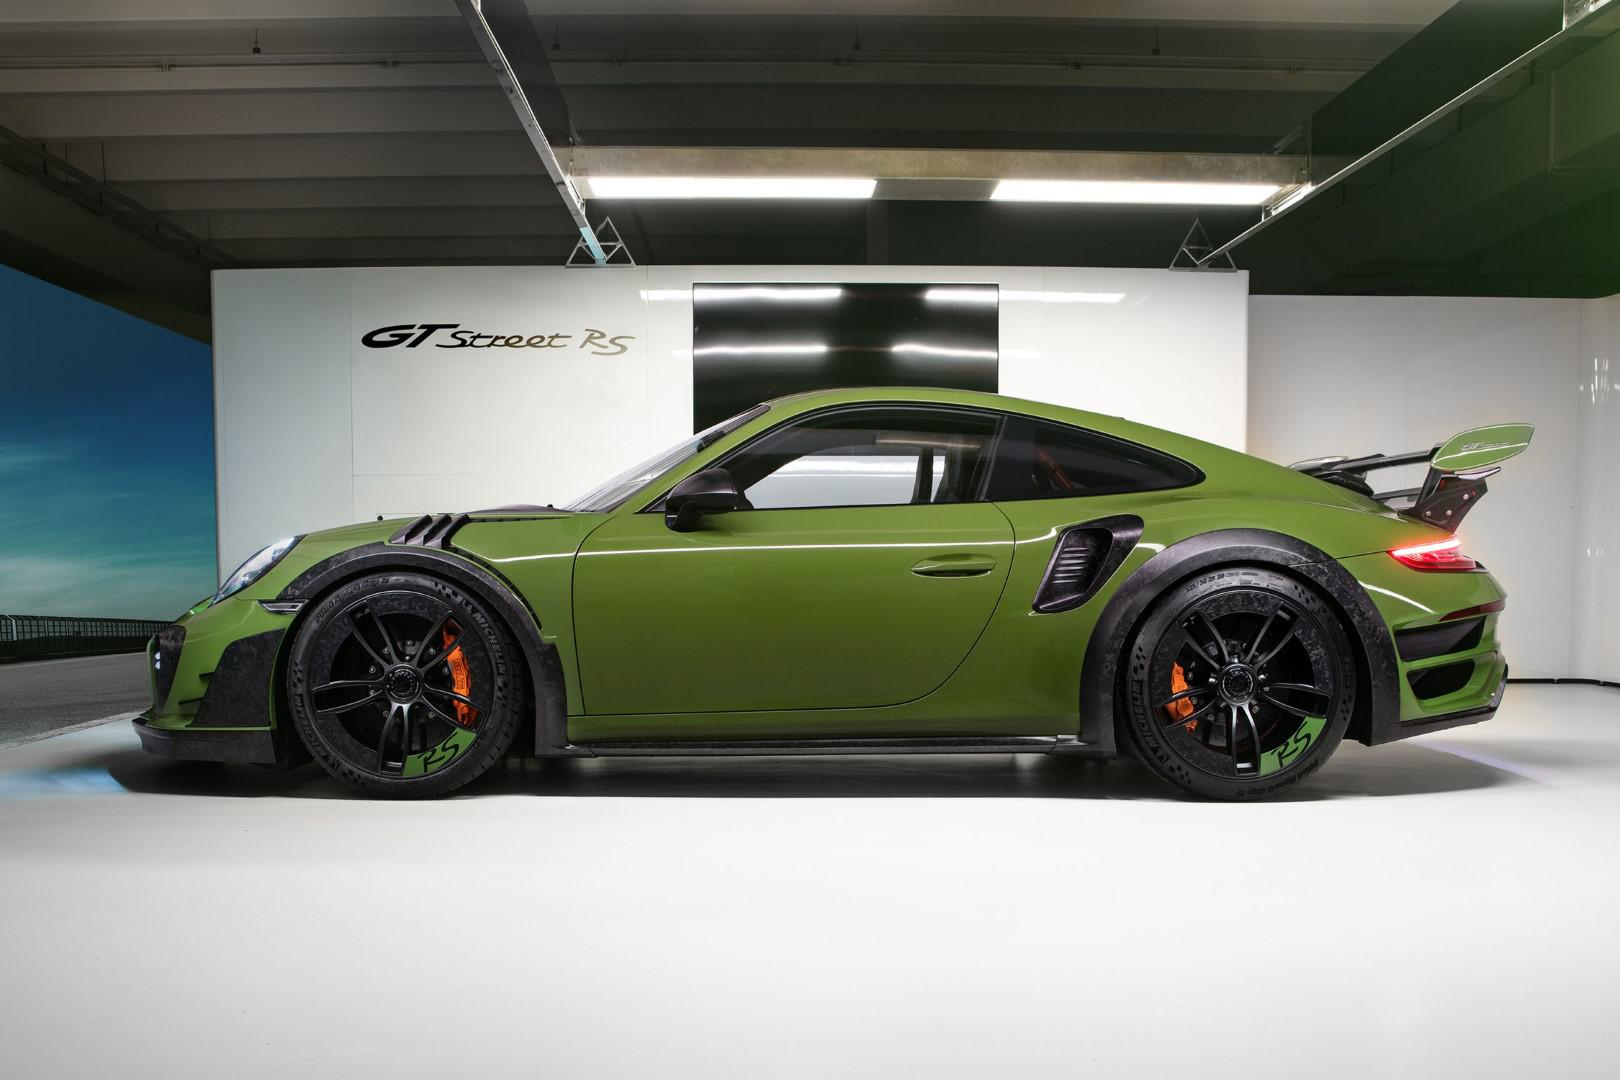 10-exemplaires-seulement-porsche-911-turbo-s-gtstreet-rs-by-techart-1049-2.jpg